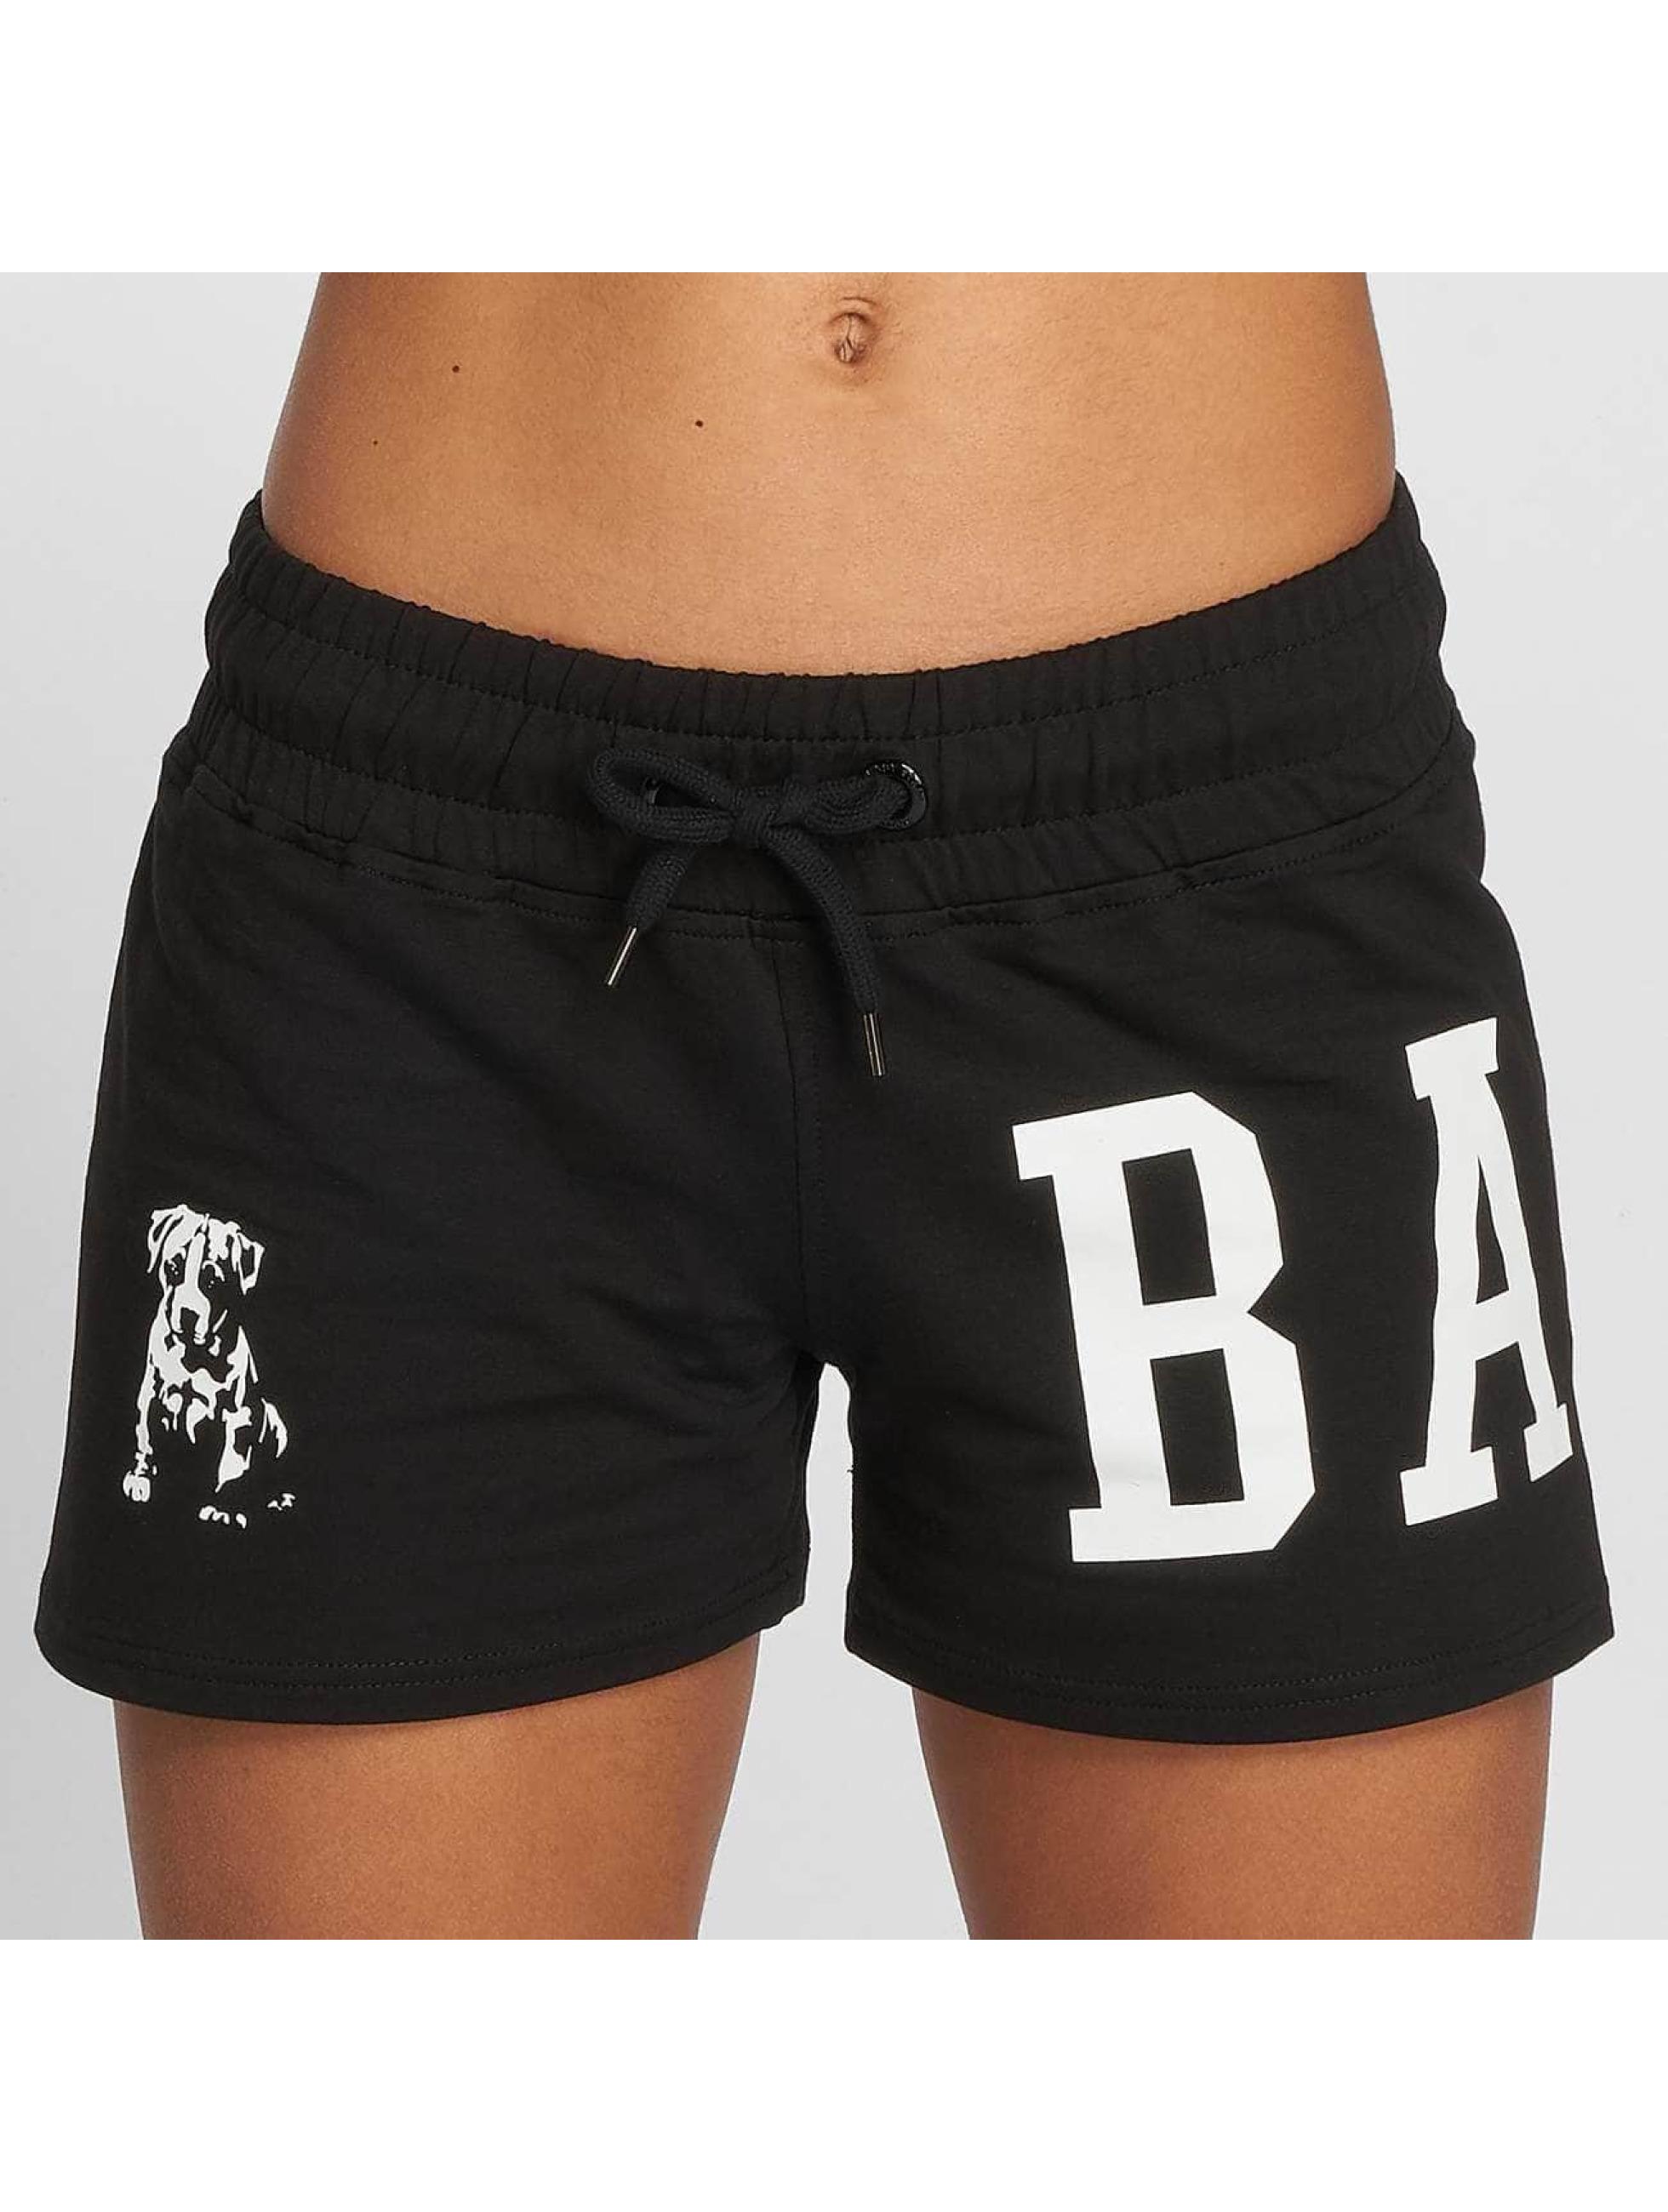 Babystaff Shorts Beva schwarz